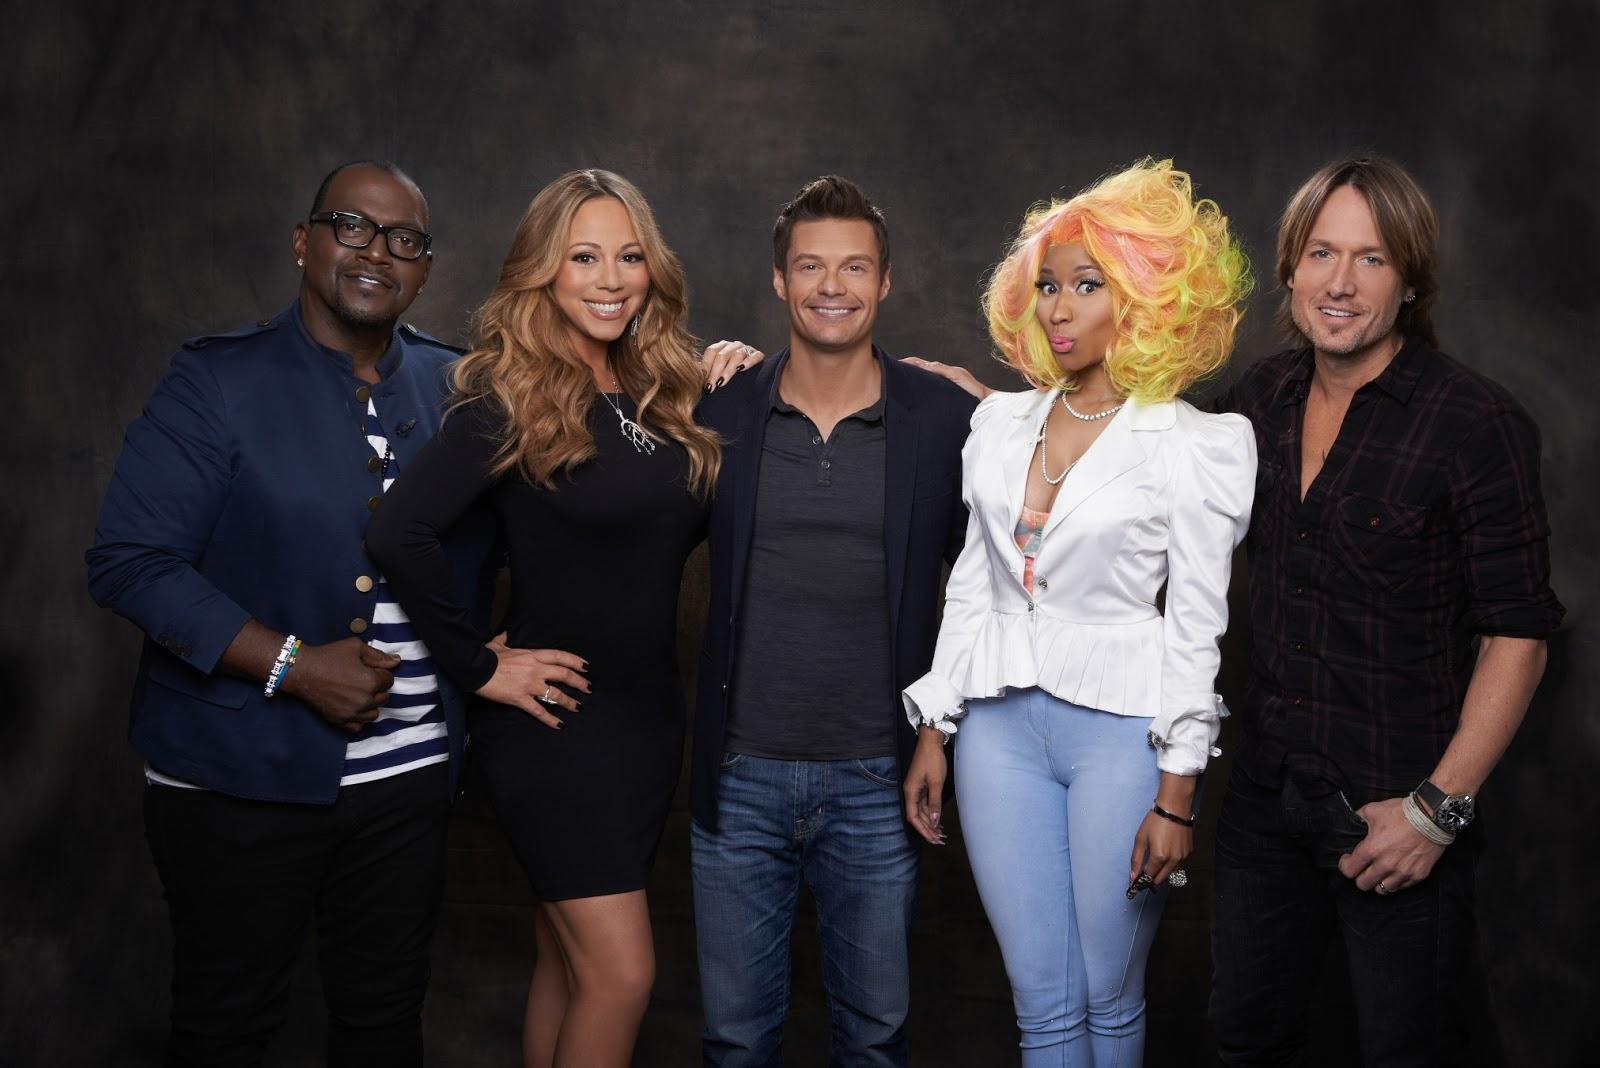 http://1.bp.blogspot.com/-hVZHC3NnuHc/UQJwUek-SuI/AAAAAAAAXz4/LE1wNC1zMEI/s1600/American-Idol-2013-judges.jpg